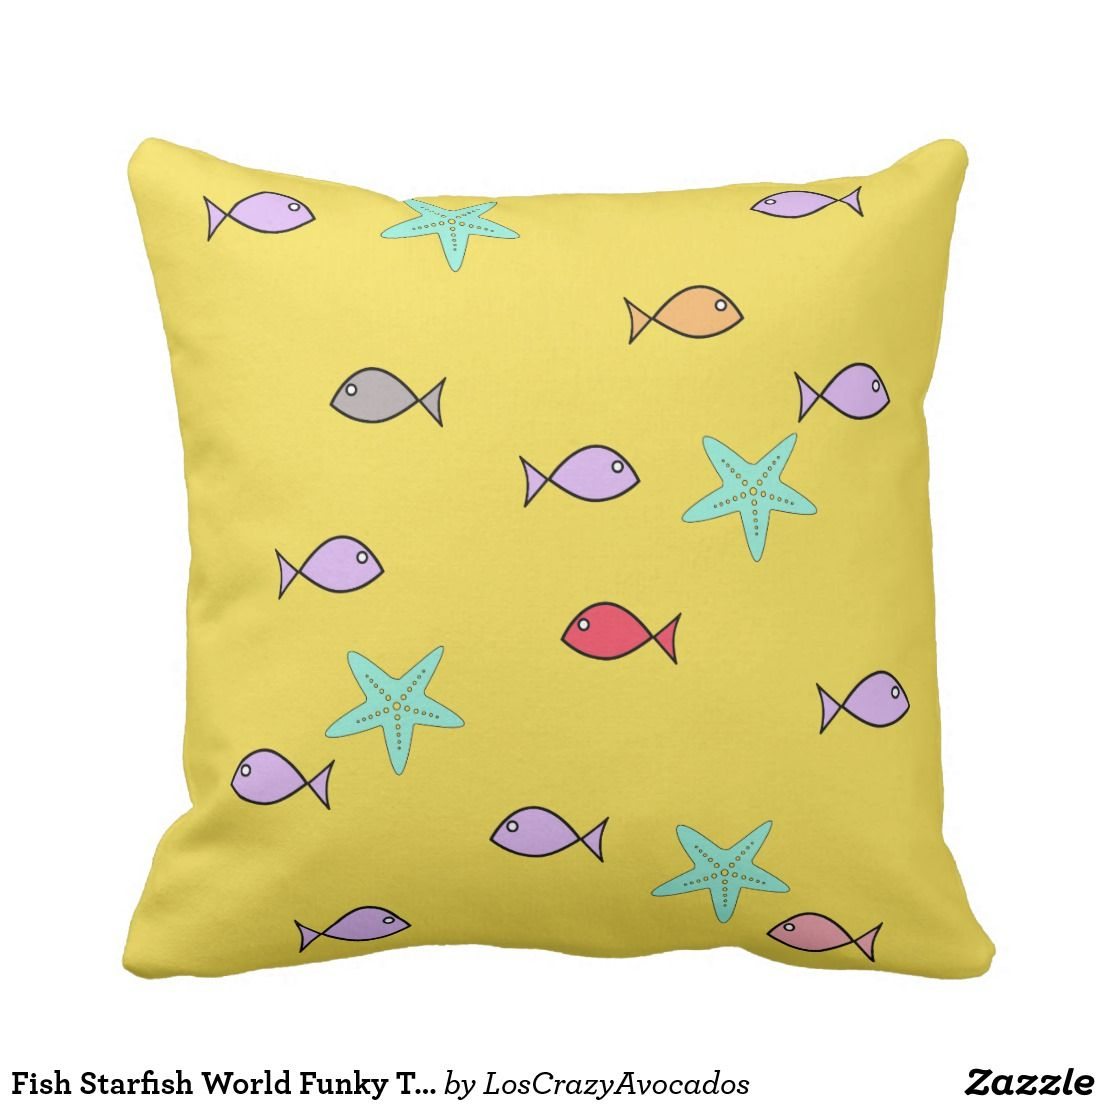 Fish Starfish World Funky Throw Pillow | Home Decor Items ...